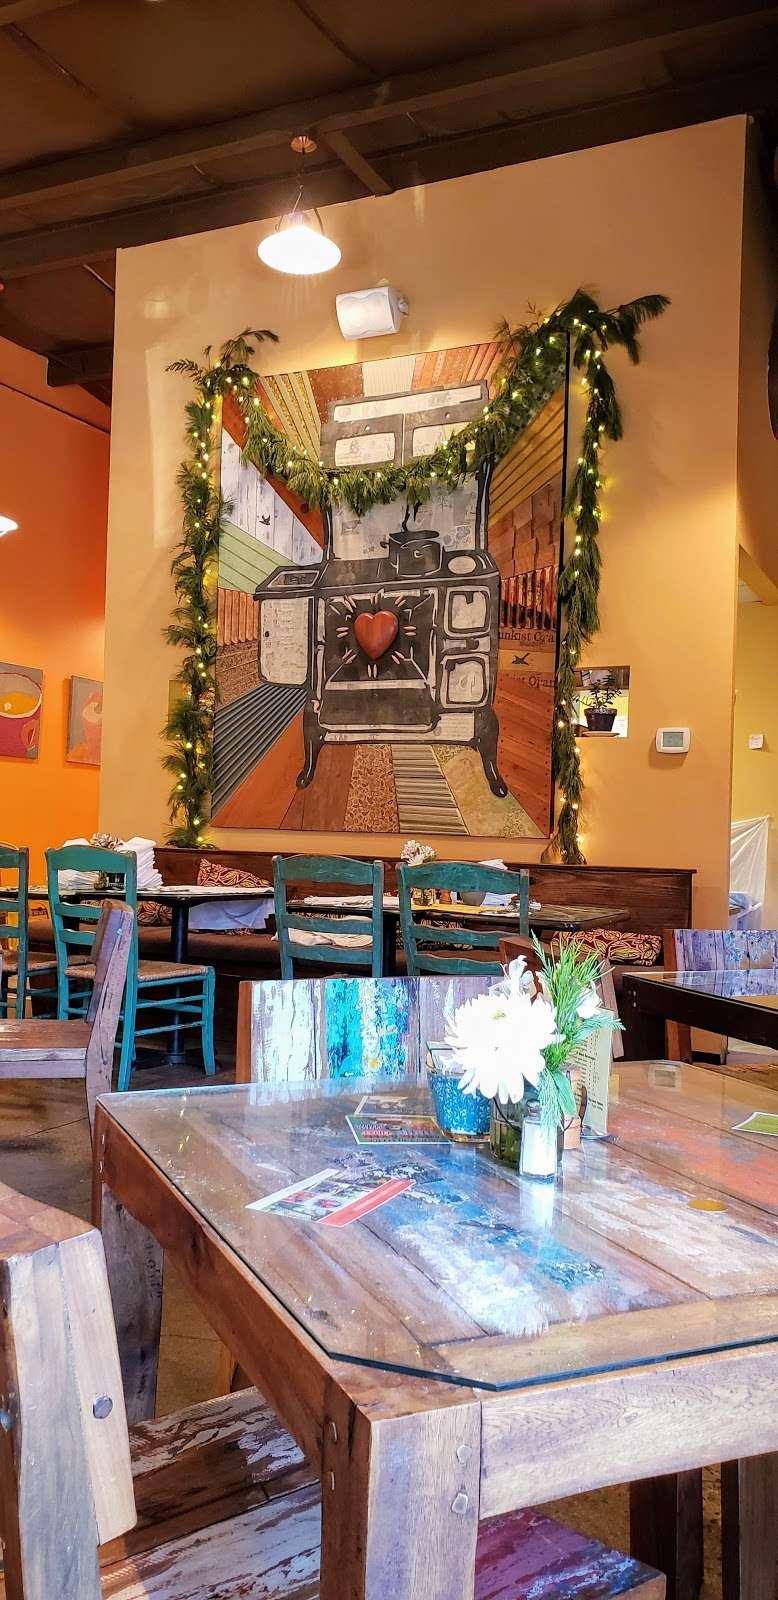 Ma-De-Chat Shop - cafe  | Photo 7 of 10 | Address: 8 Railroad Ave, Milford, NJ 08848, USA | Phone: (908) 995-2980